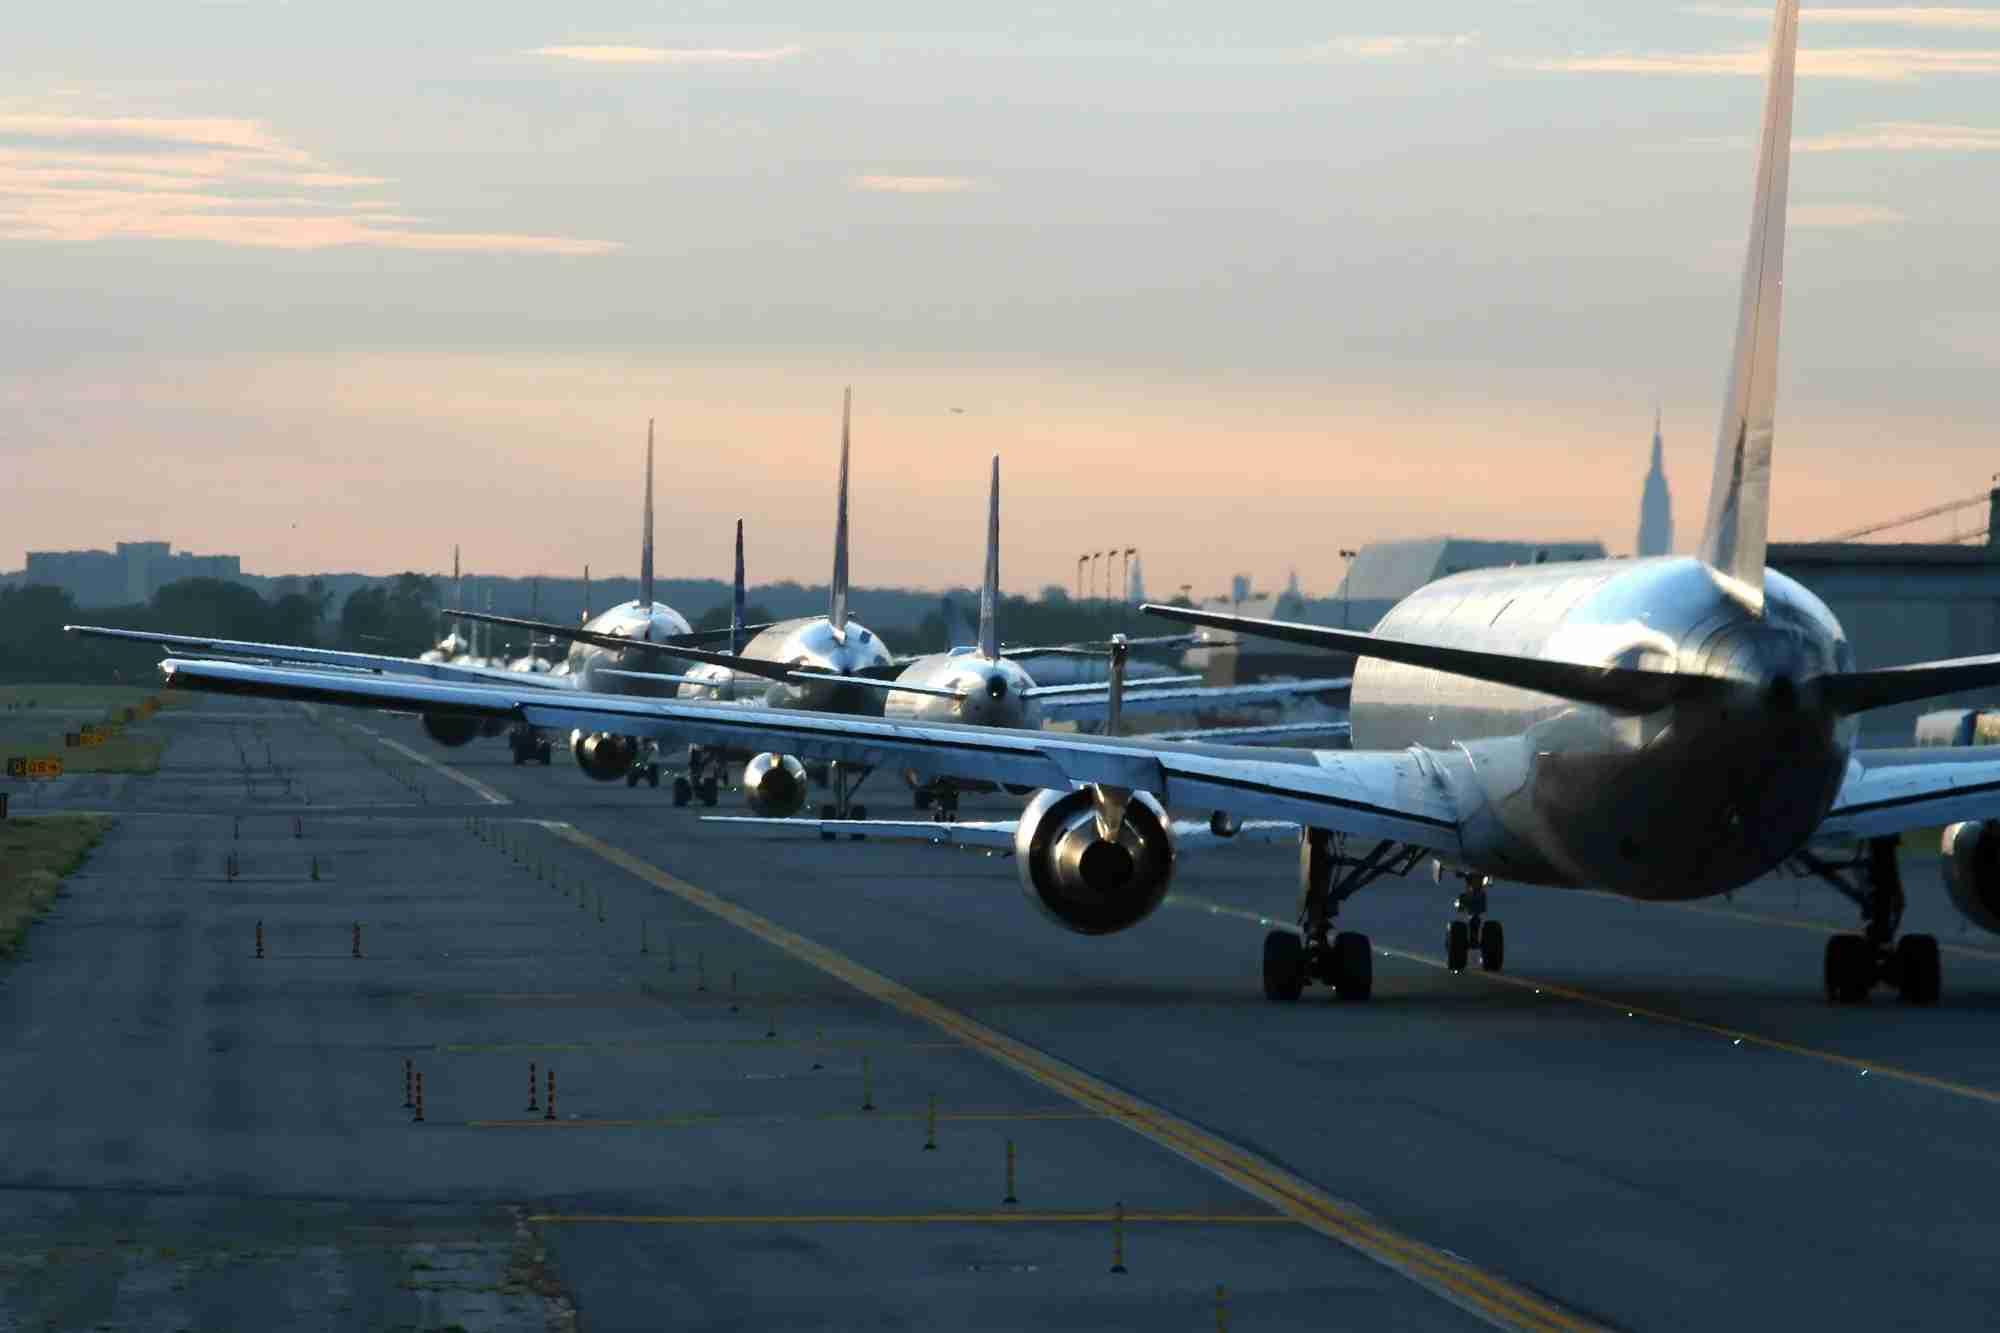 evening traffic at New York JFK airport